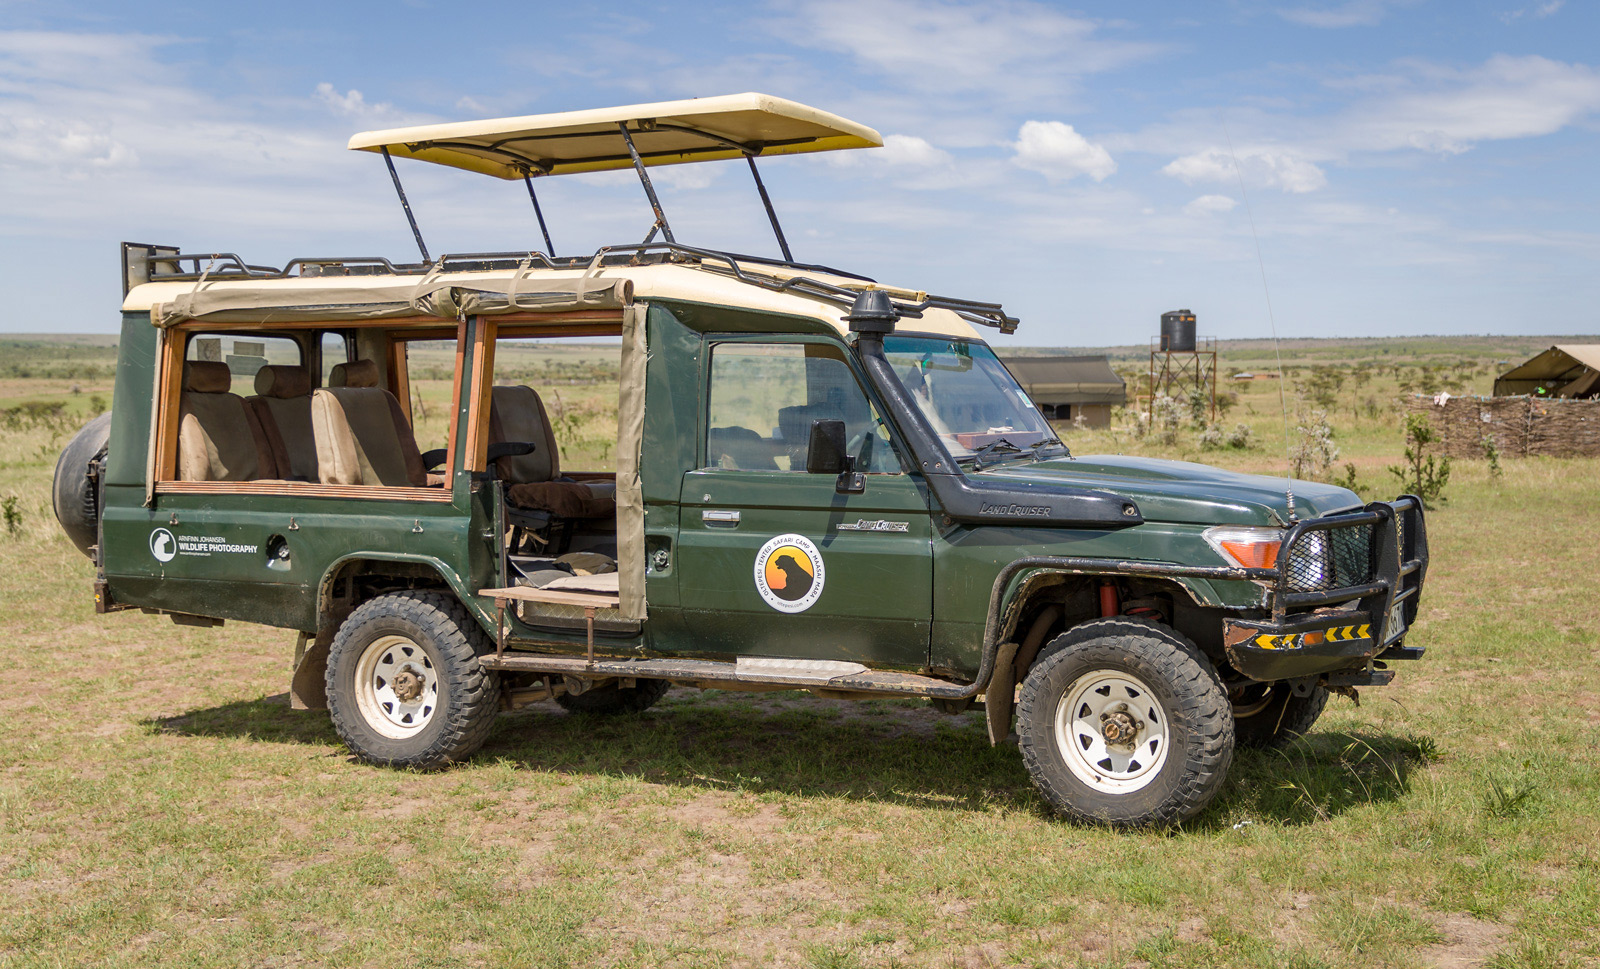 The safari vehicle has been specially designed to accommodate photographers © Ruzdi Ekenheim